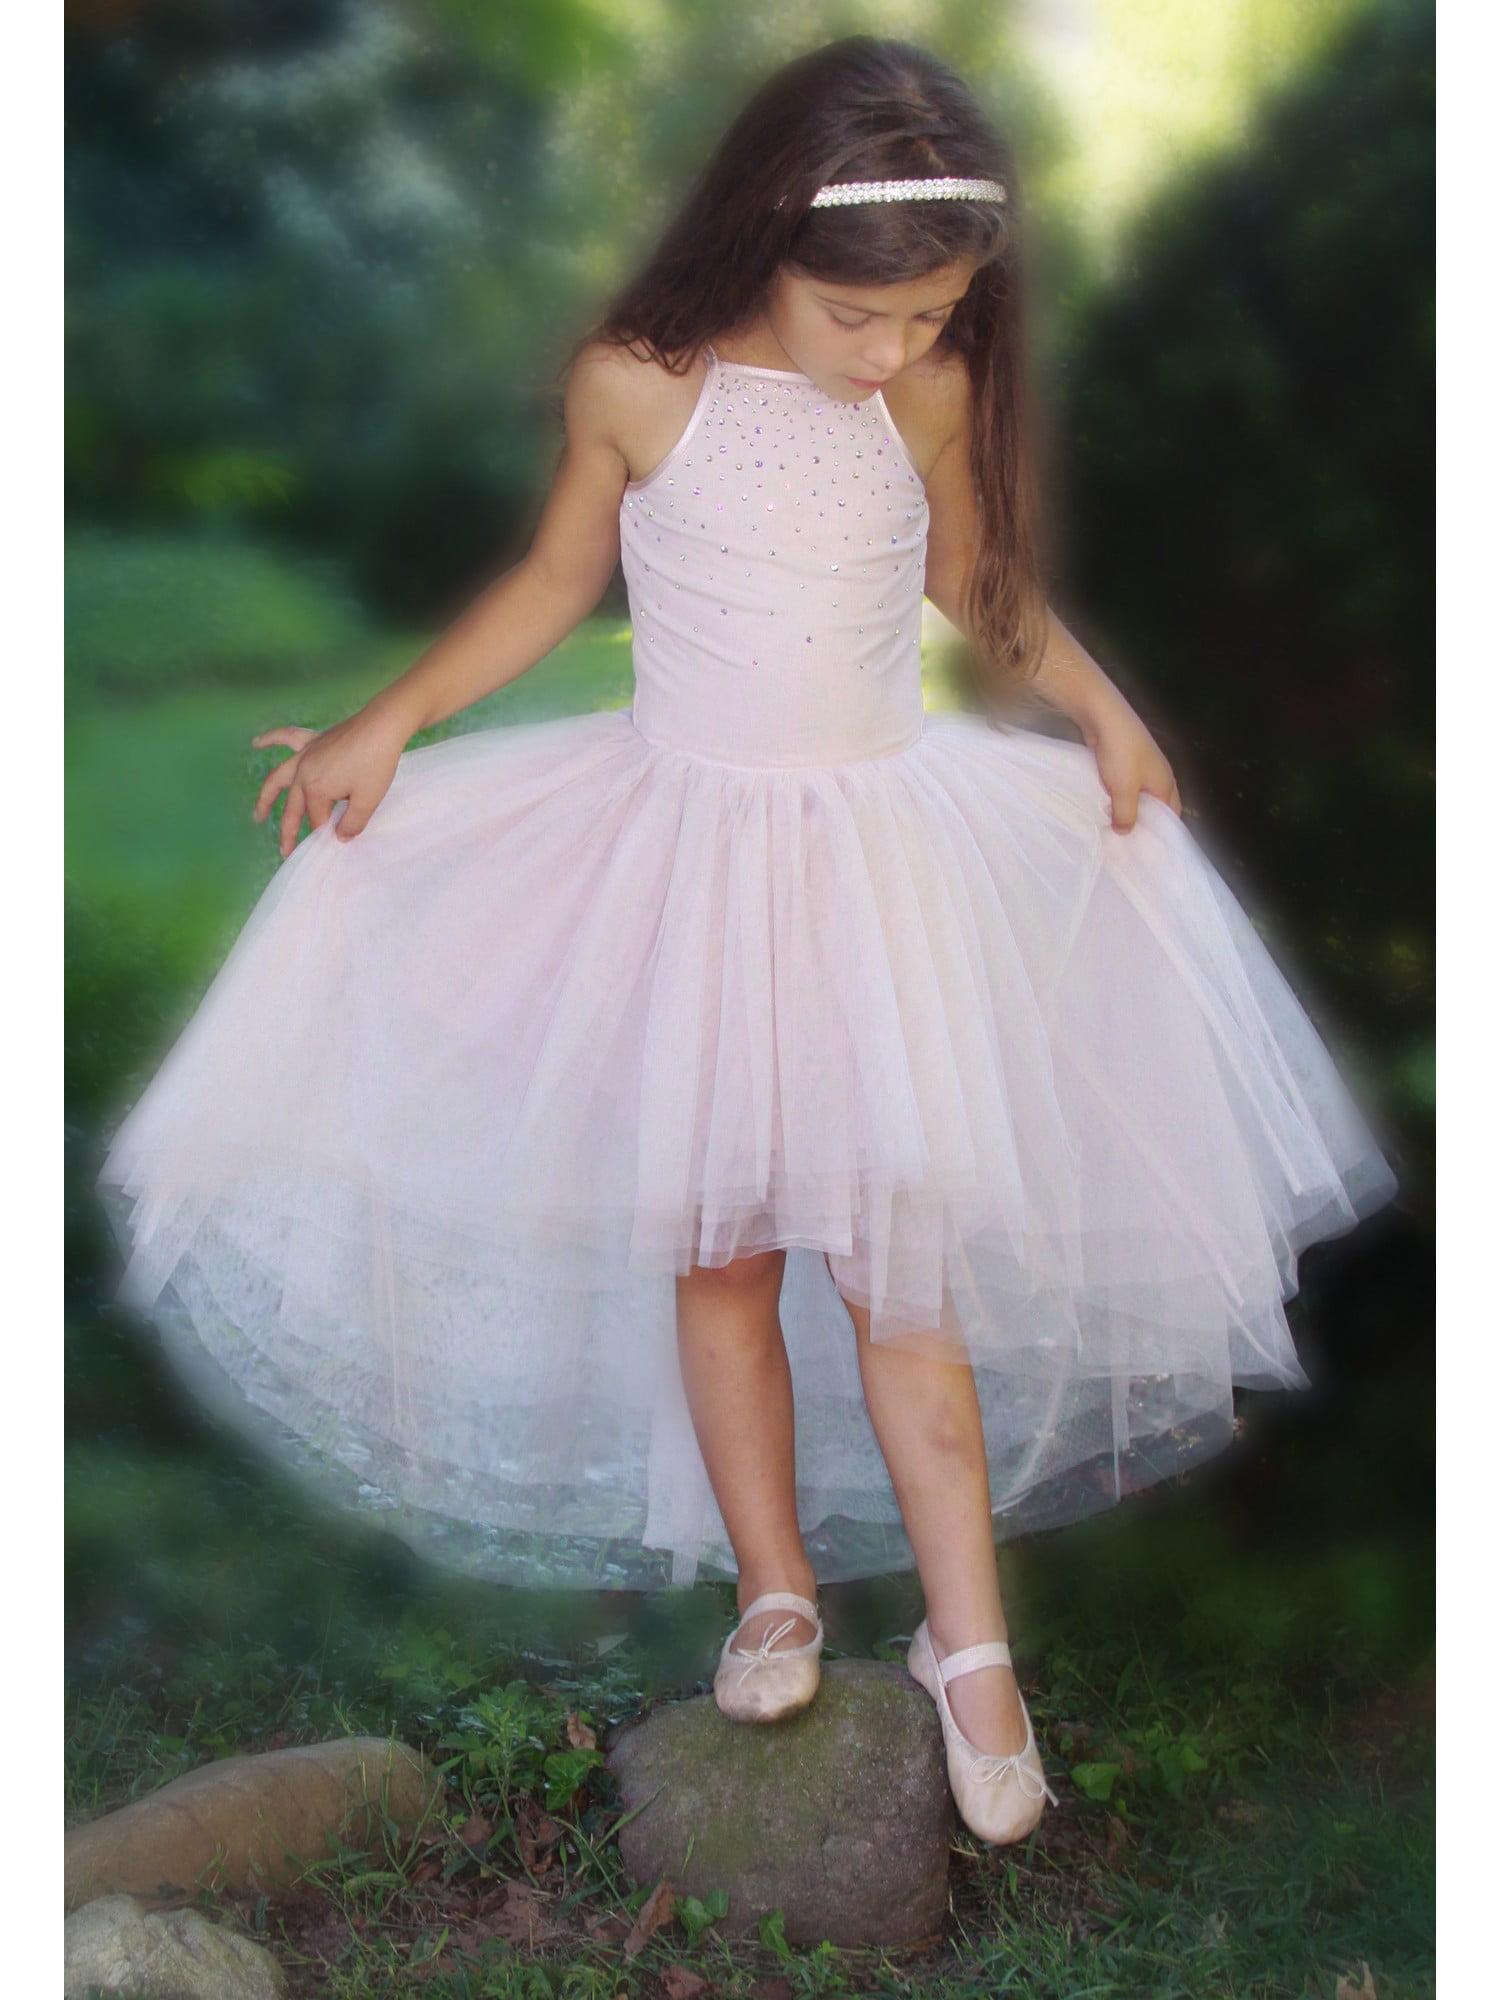 Ooh La La Couture Kids Tutu Dress baby blue cream bow rhinestones sleeveless